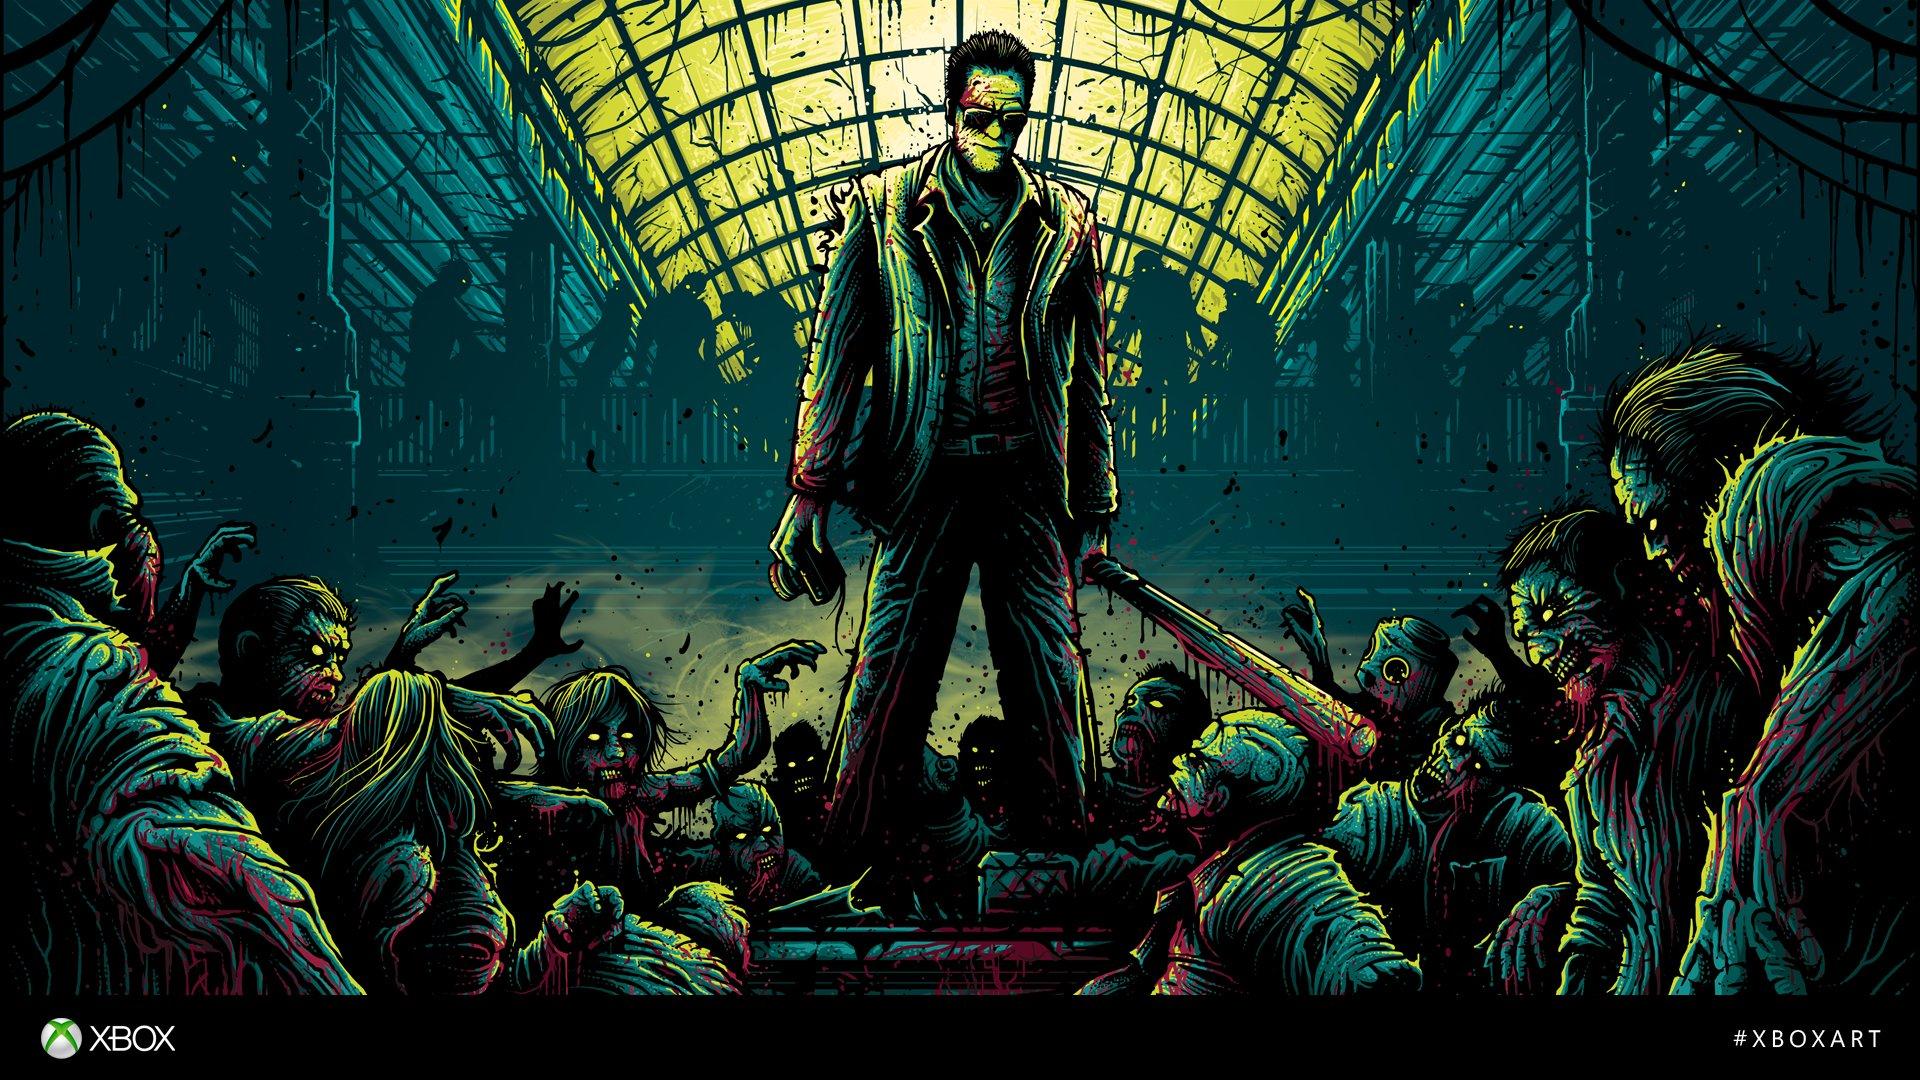 Danmumford zombie badass alone wallpaper 1920x1080 - Badass backgrounds ...